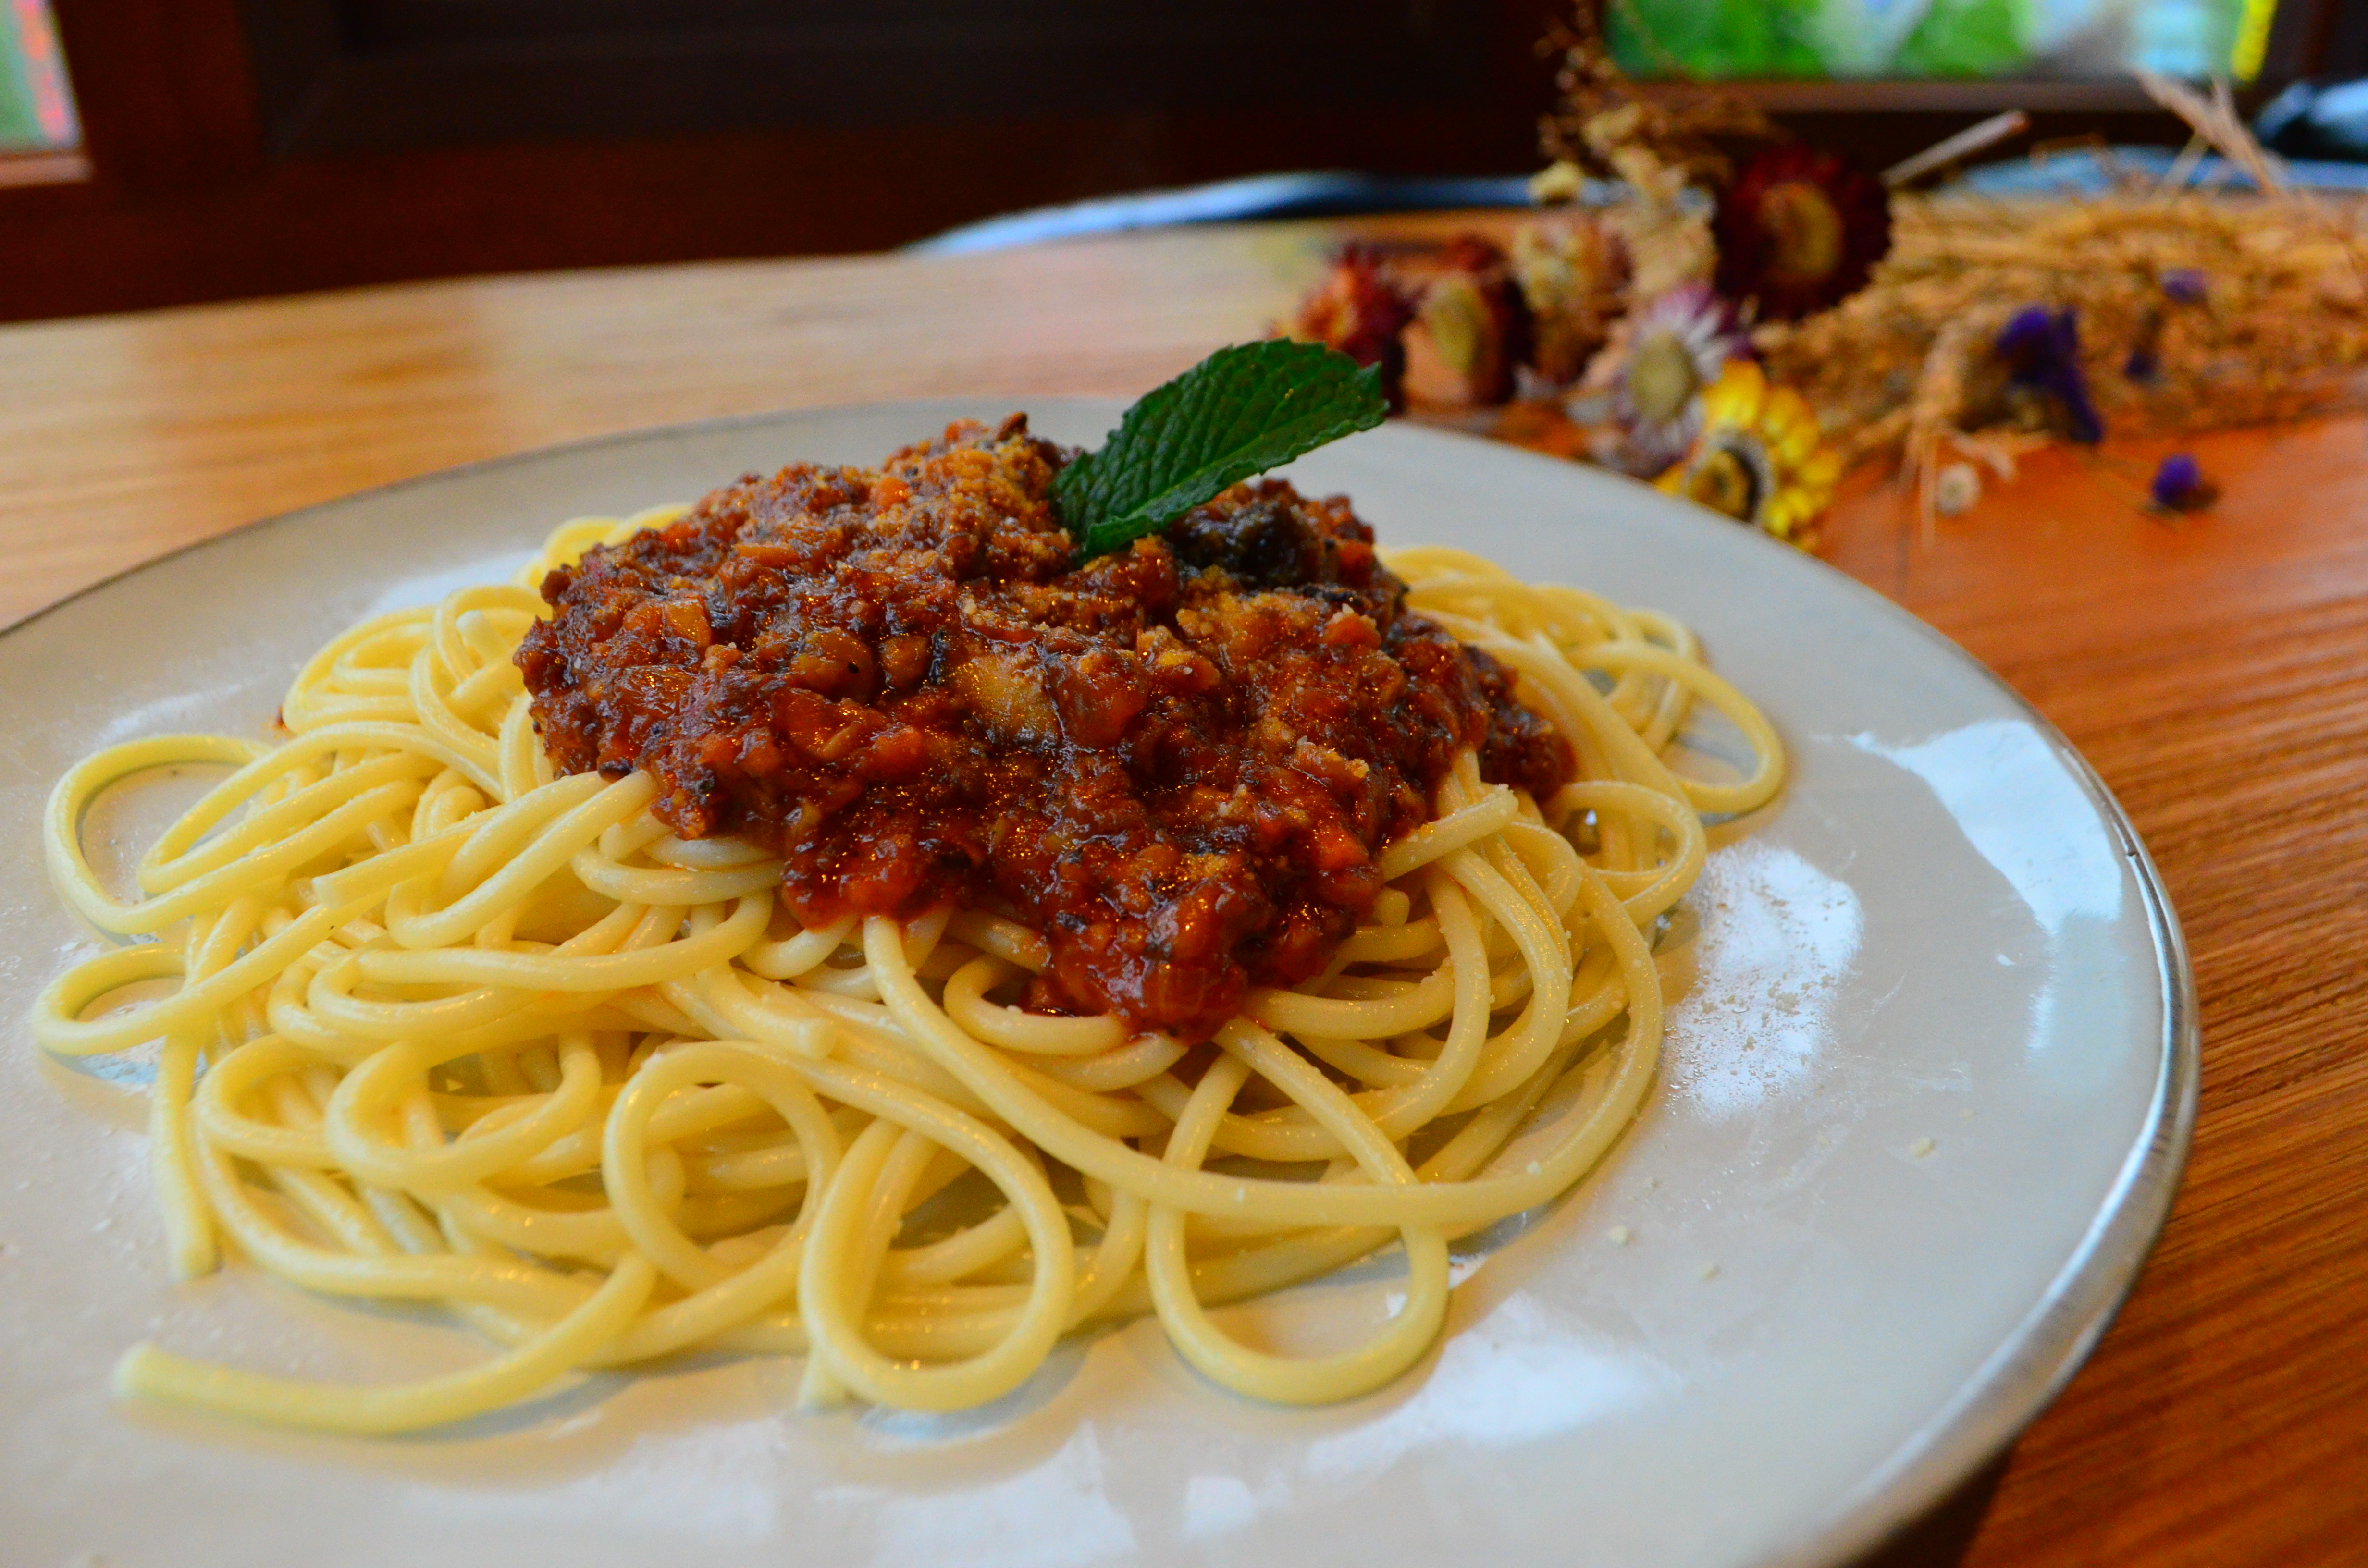 Tibetan Yak Spaghetti Bolognese